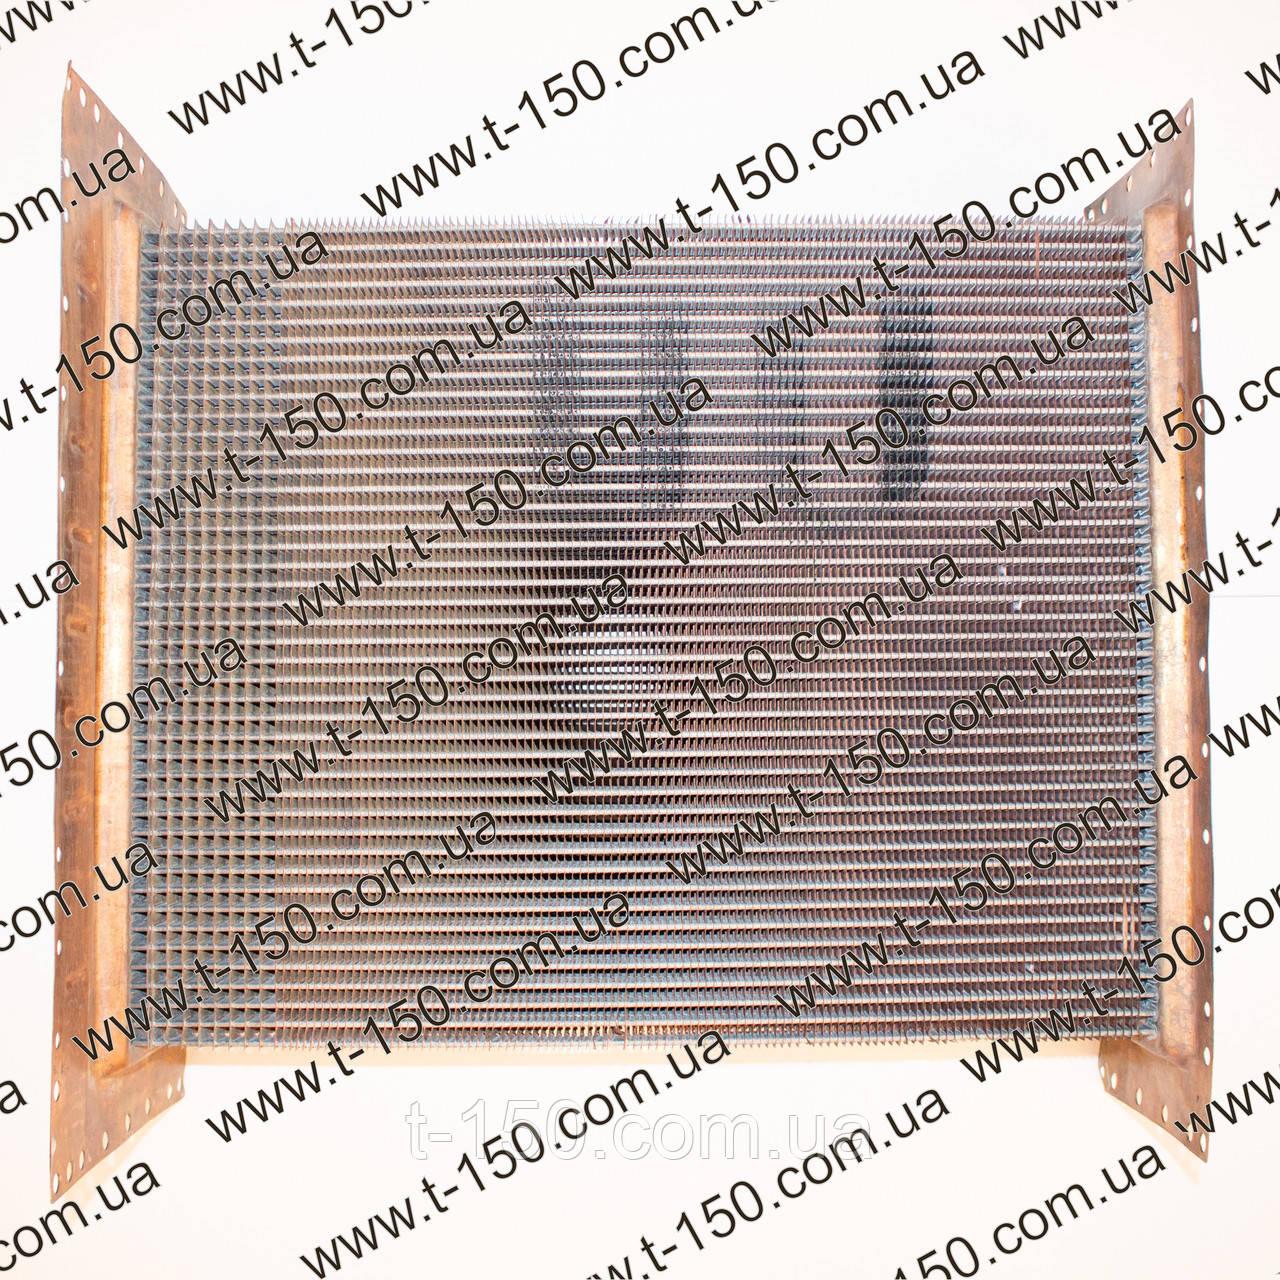 Сердцевина радиатора Д-65 (4-х рядная ) Китай, 45У.1301.020